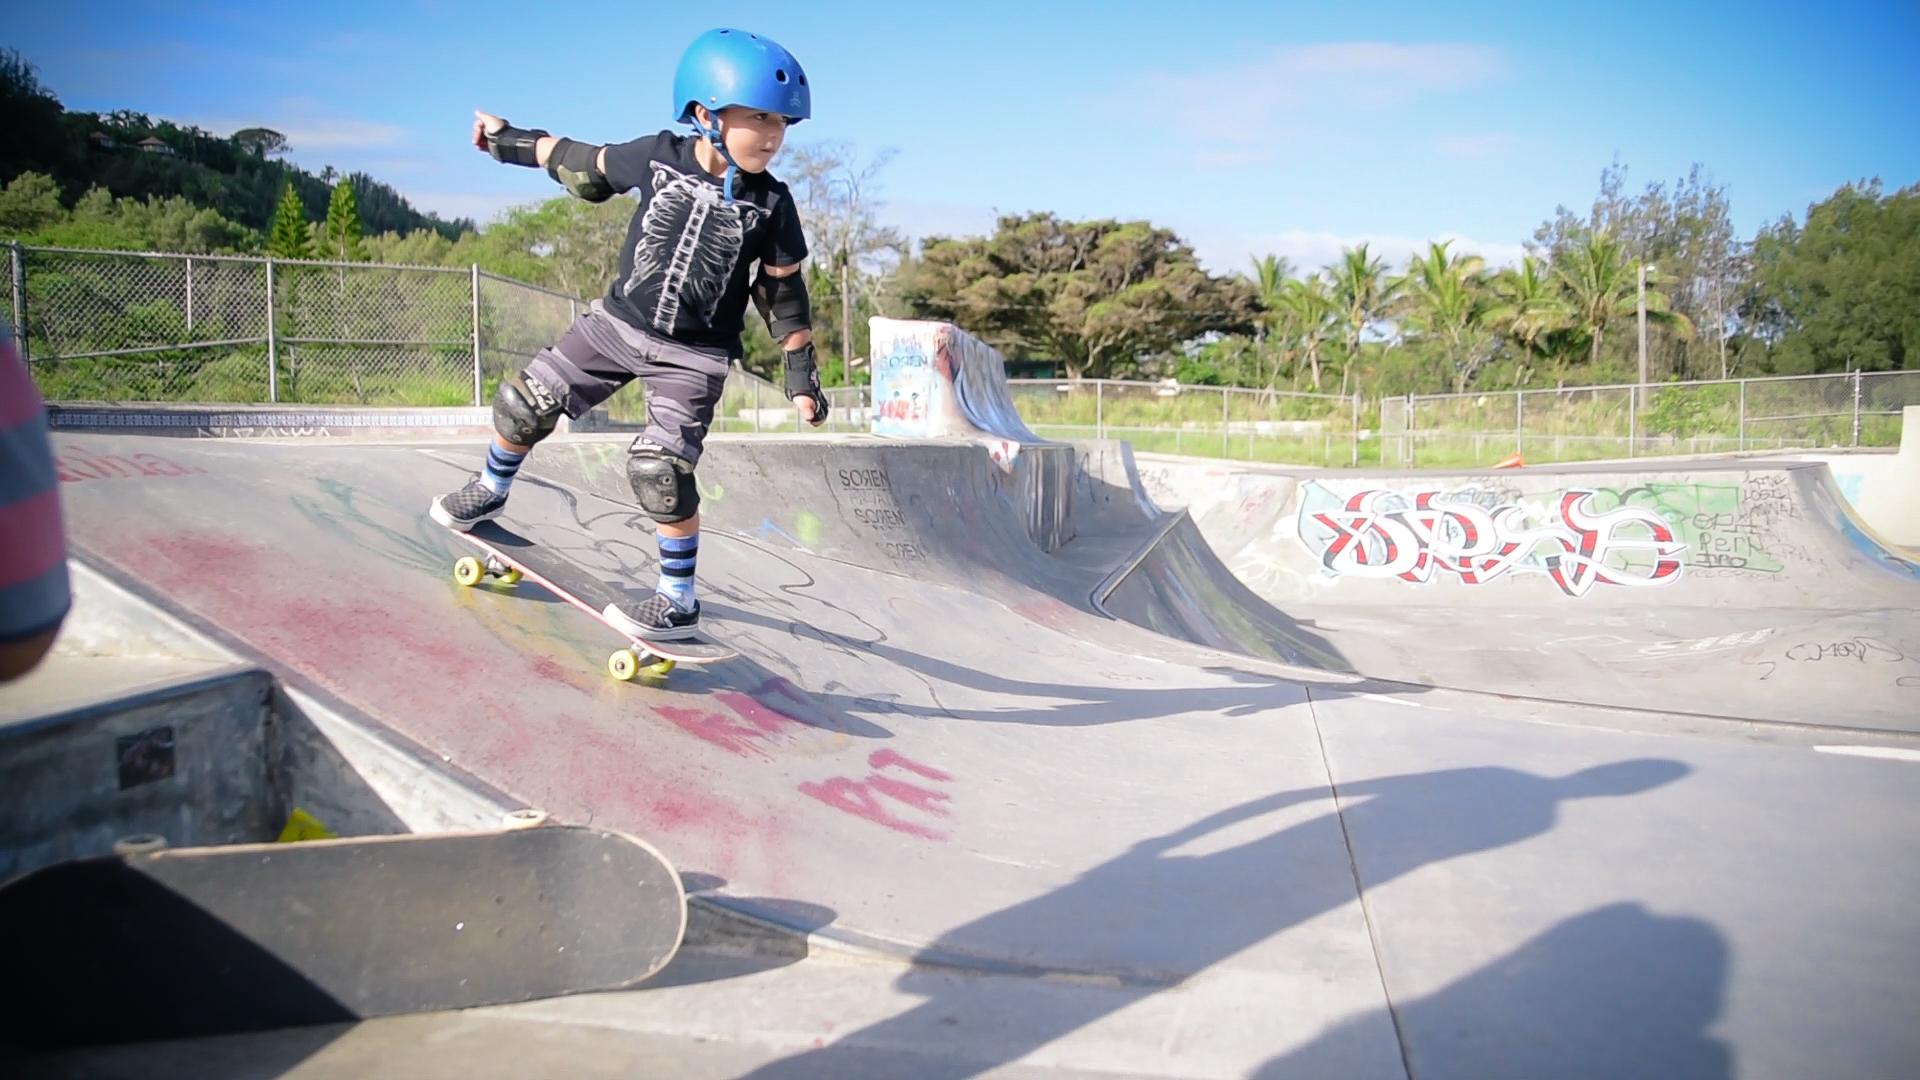 boy riding skate board by springfield illinois photographer lydia stuemke